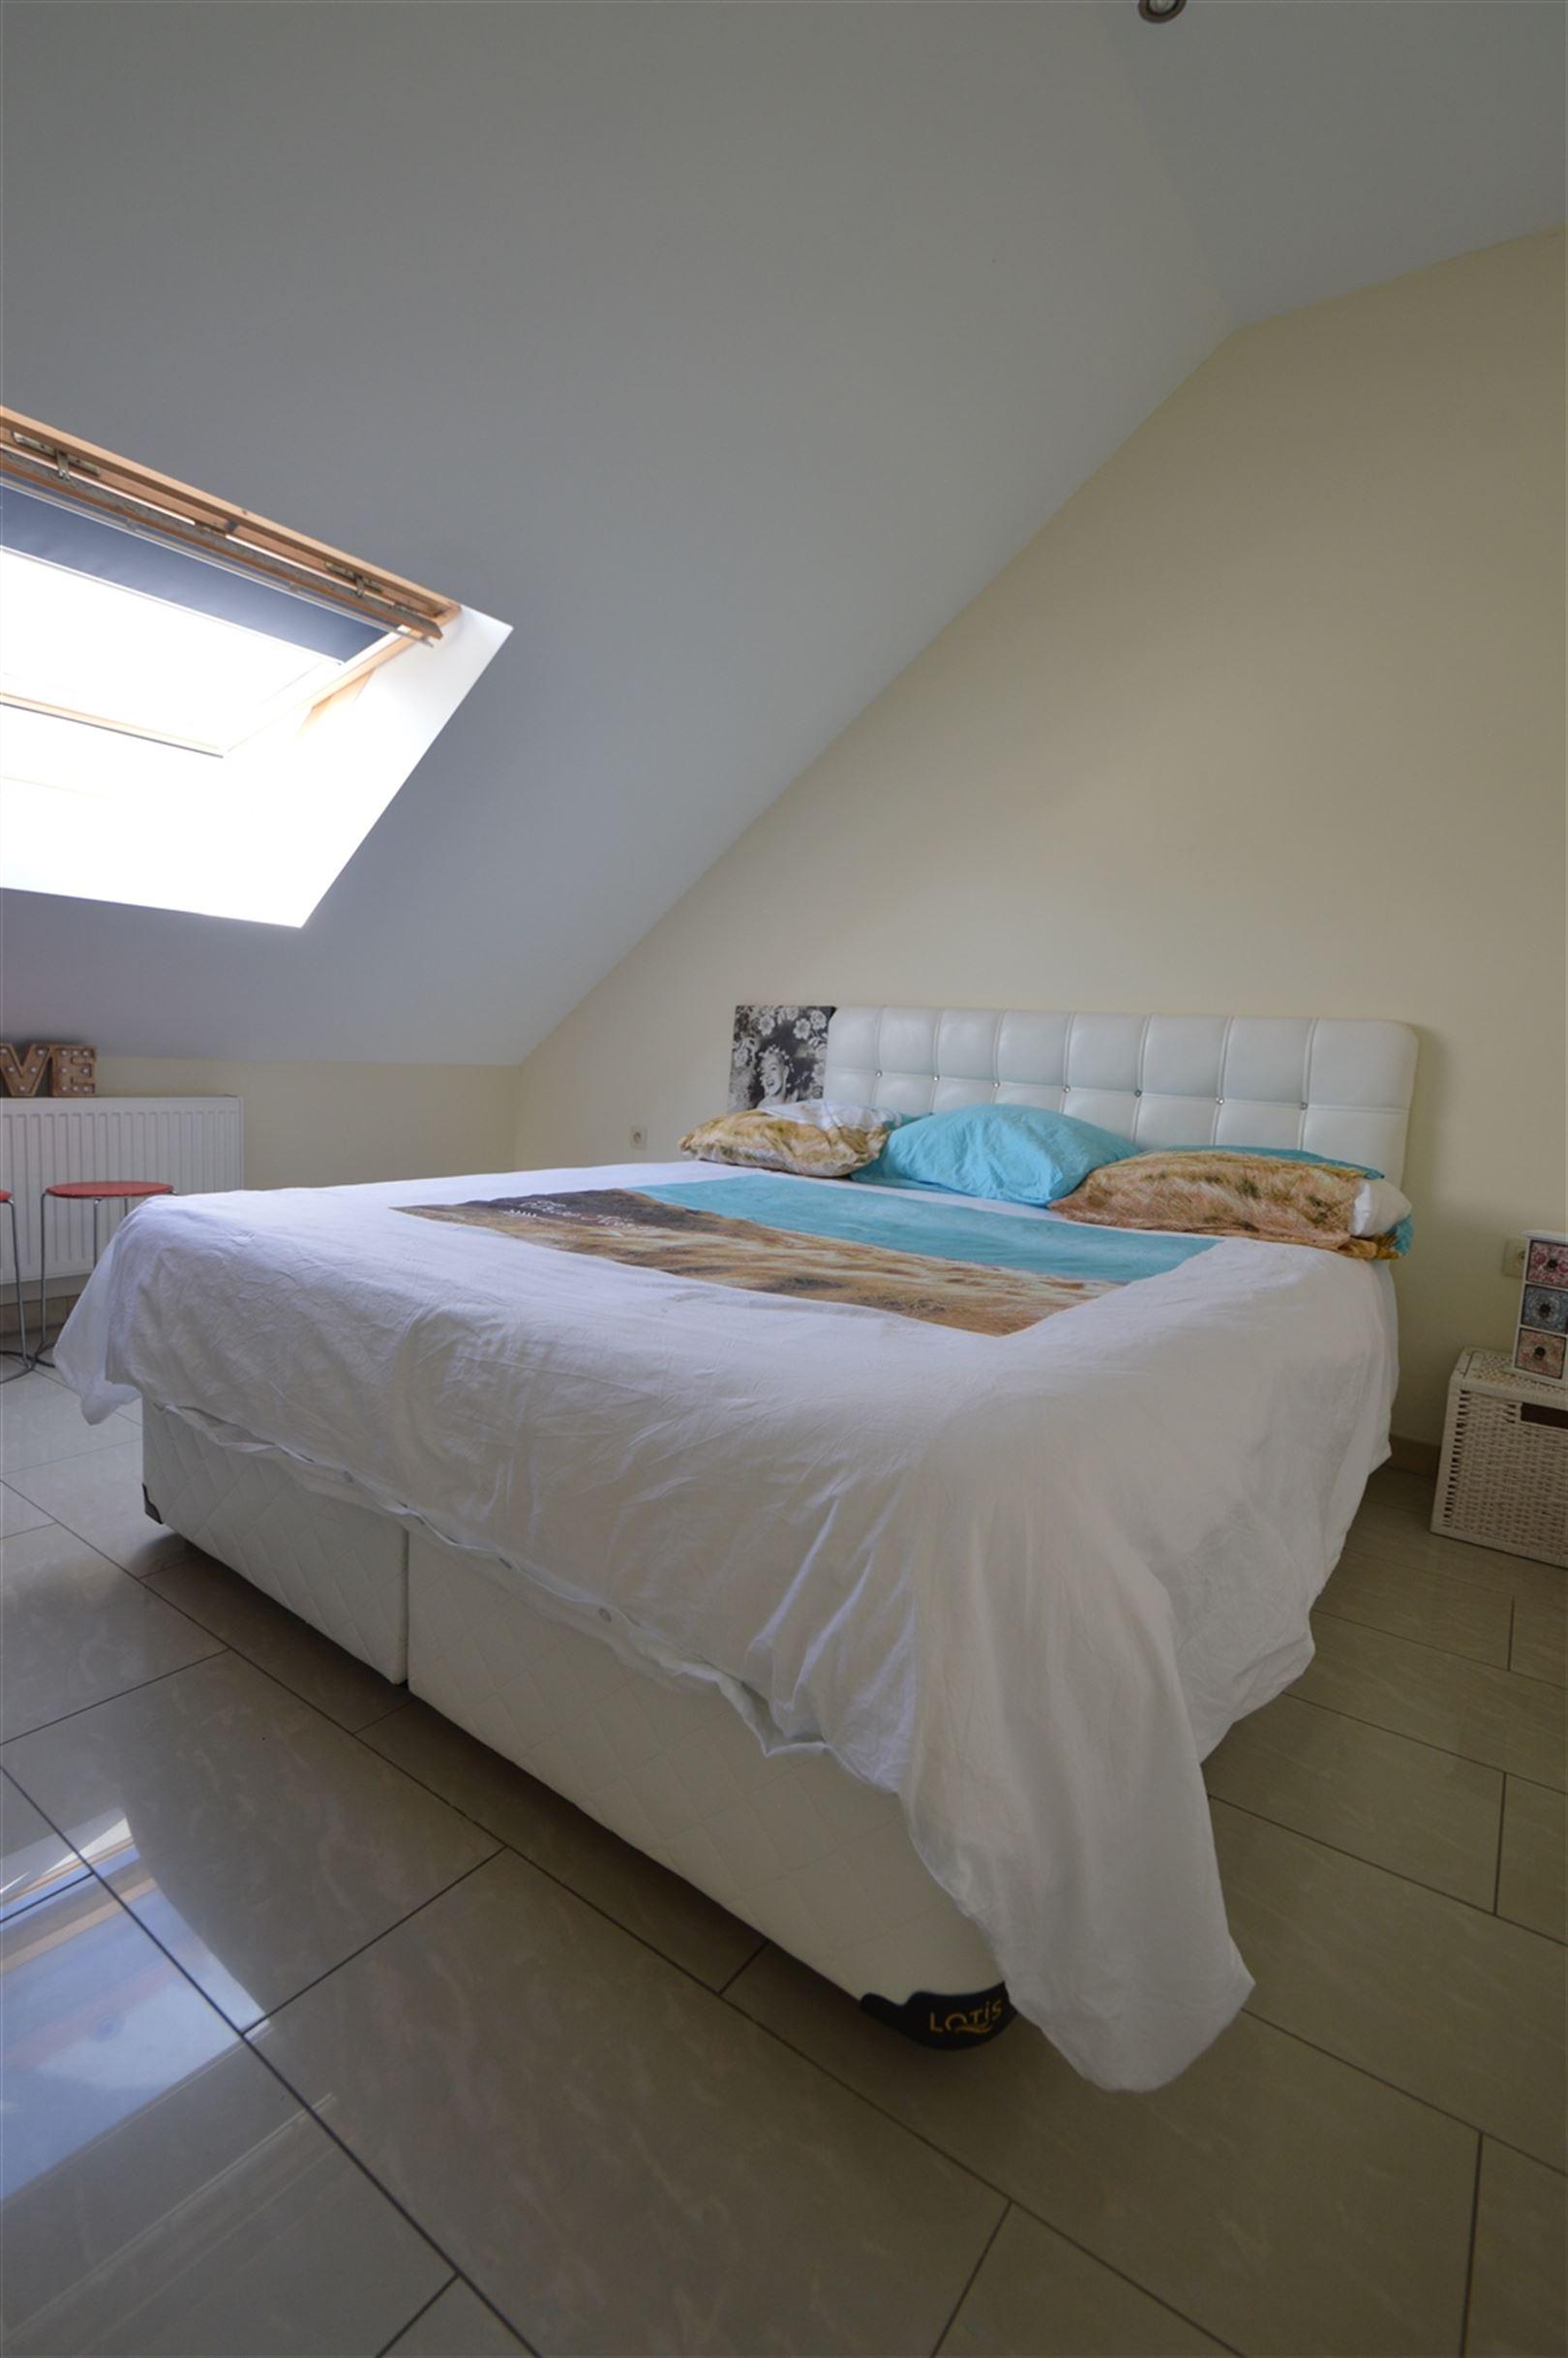 Foto 4 : Appartement te  BAASRODE (België) - Prijs € 495